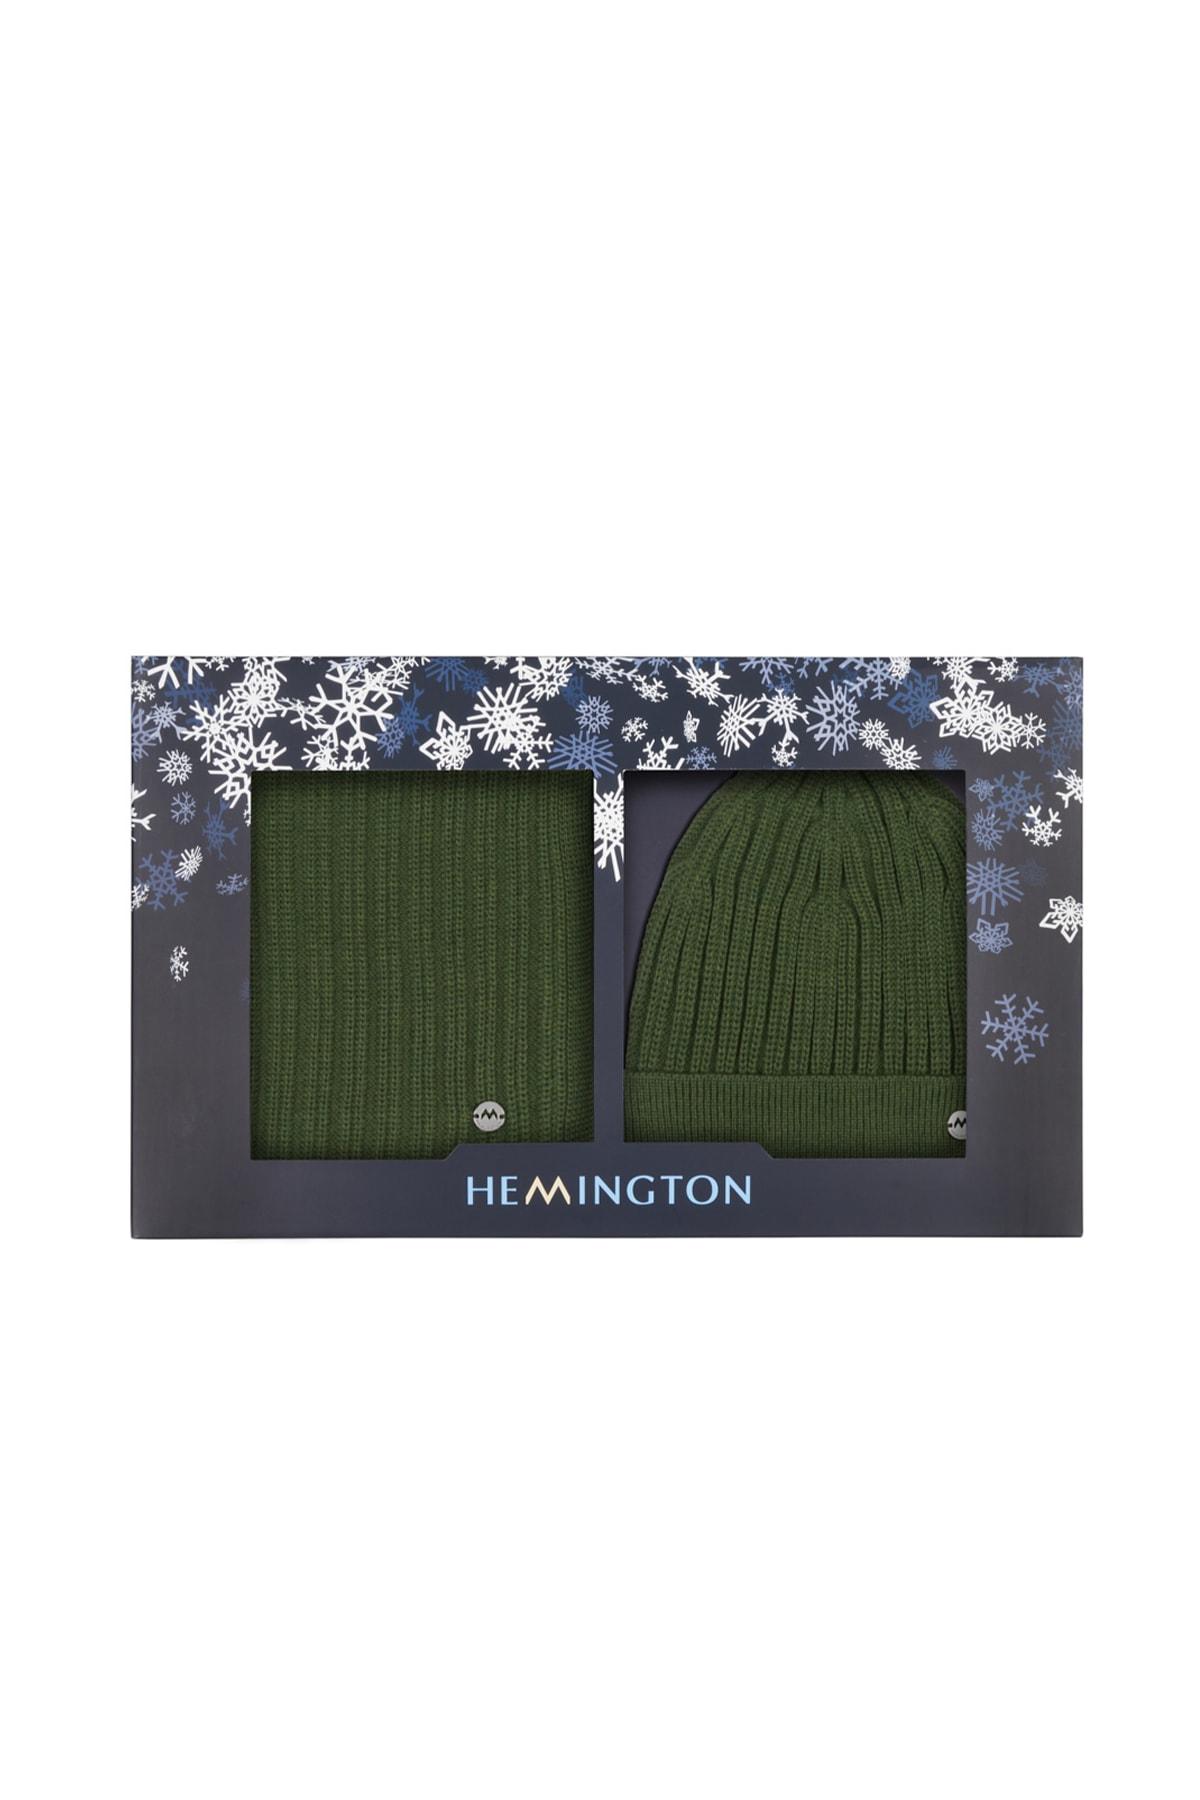 Hemington Koyu Yeşil Merino Yün Atkı 2